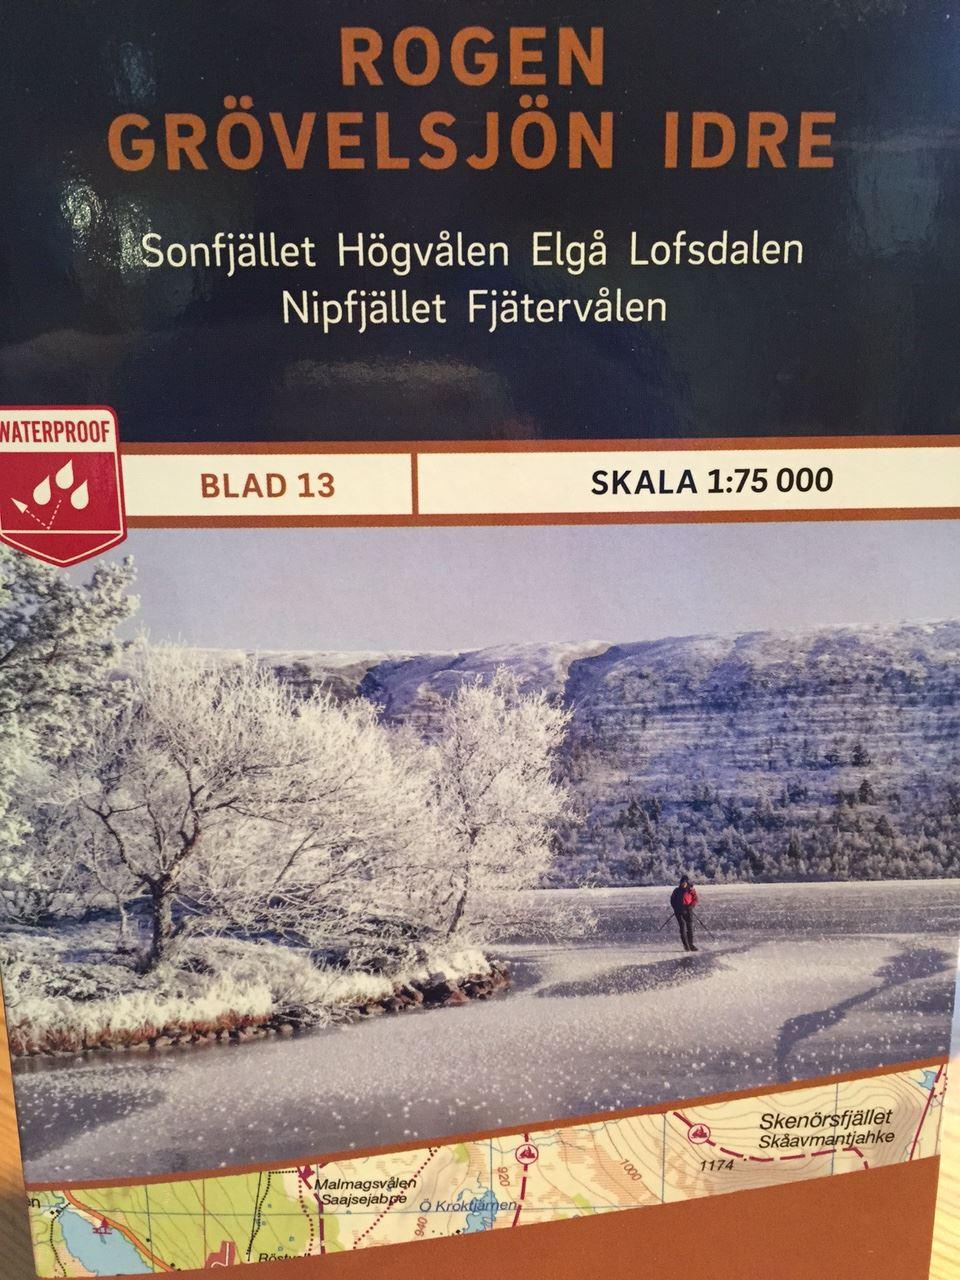 Rogen-Grövelsjön-Idre 1:75 000